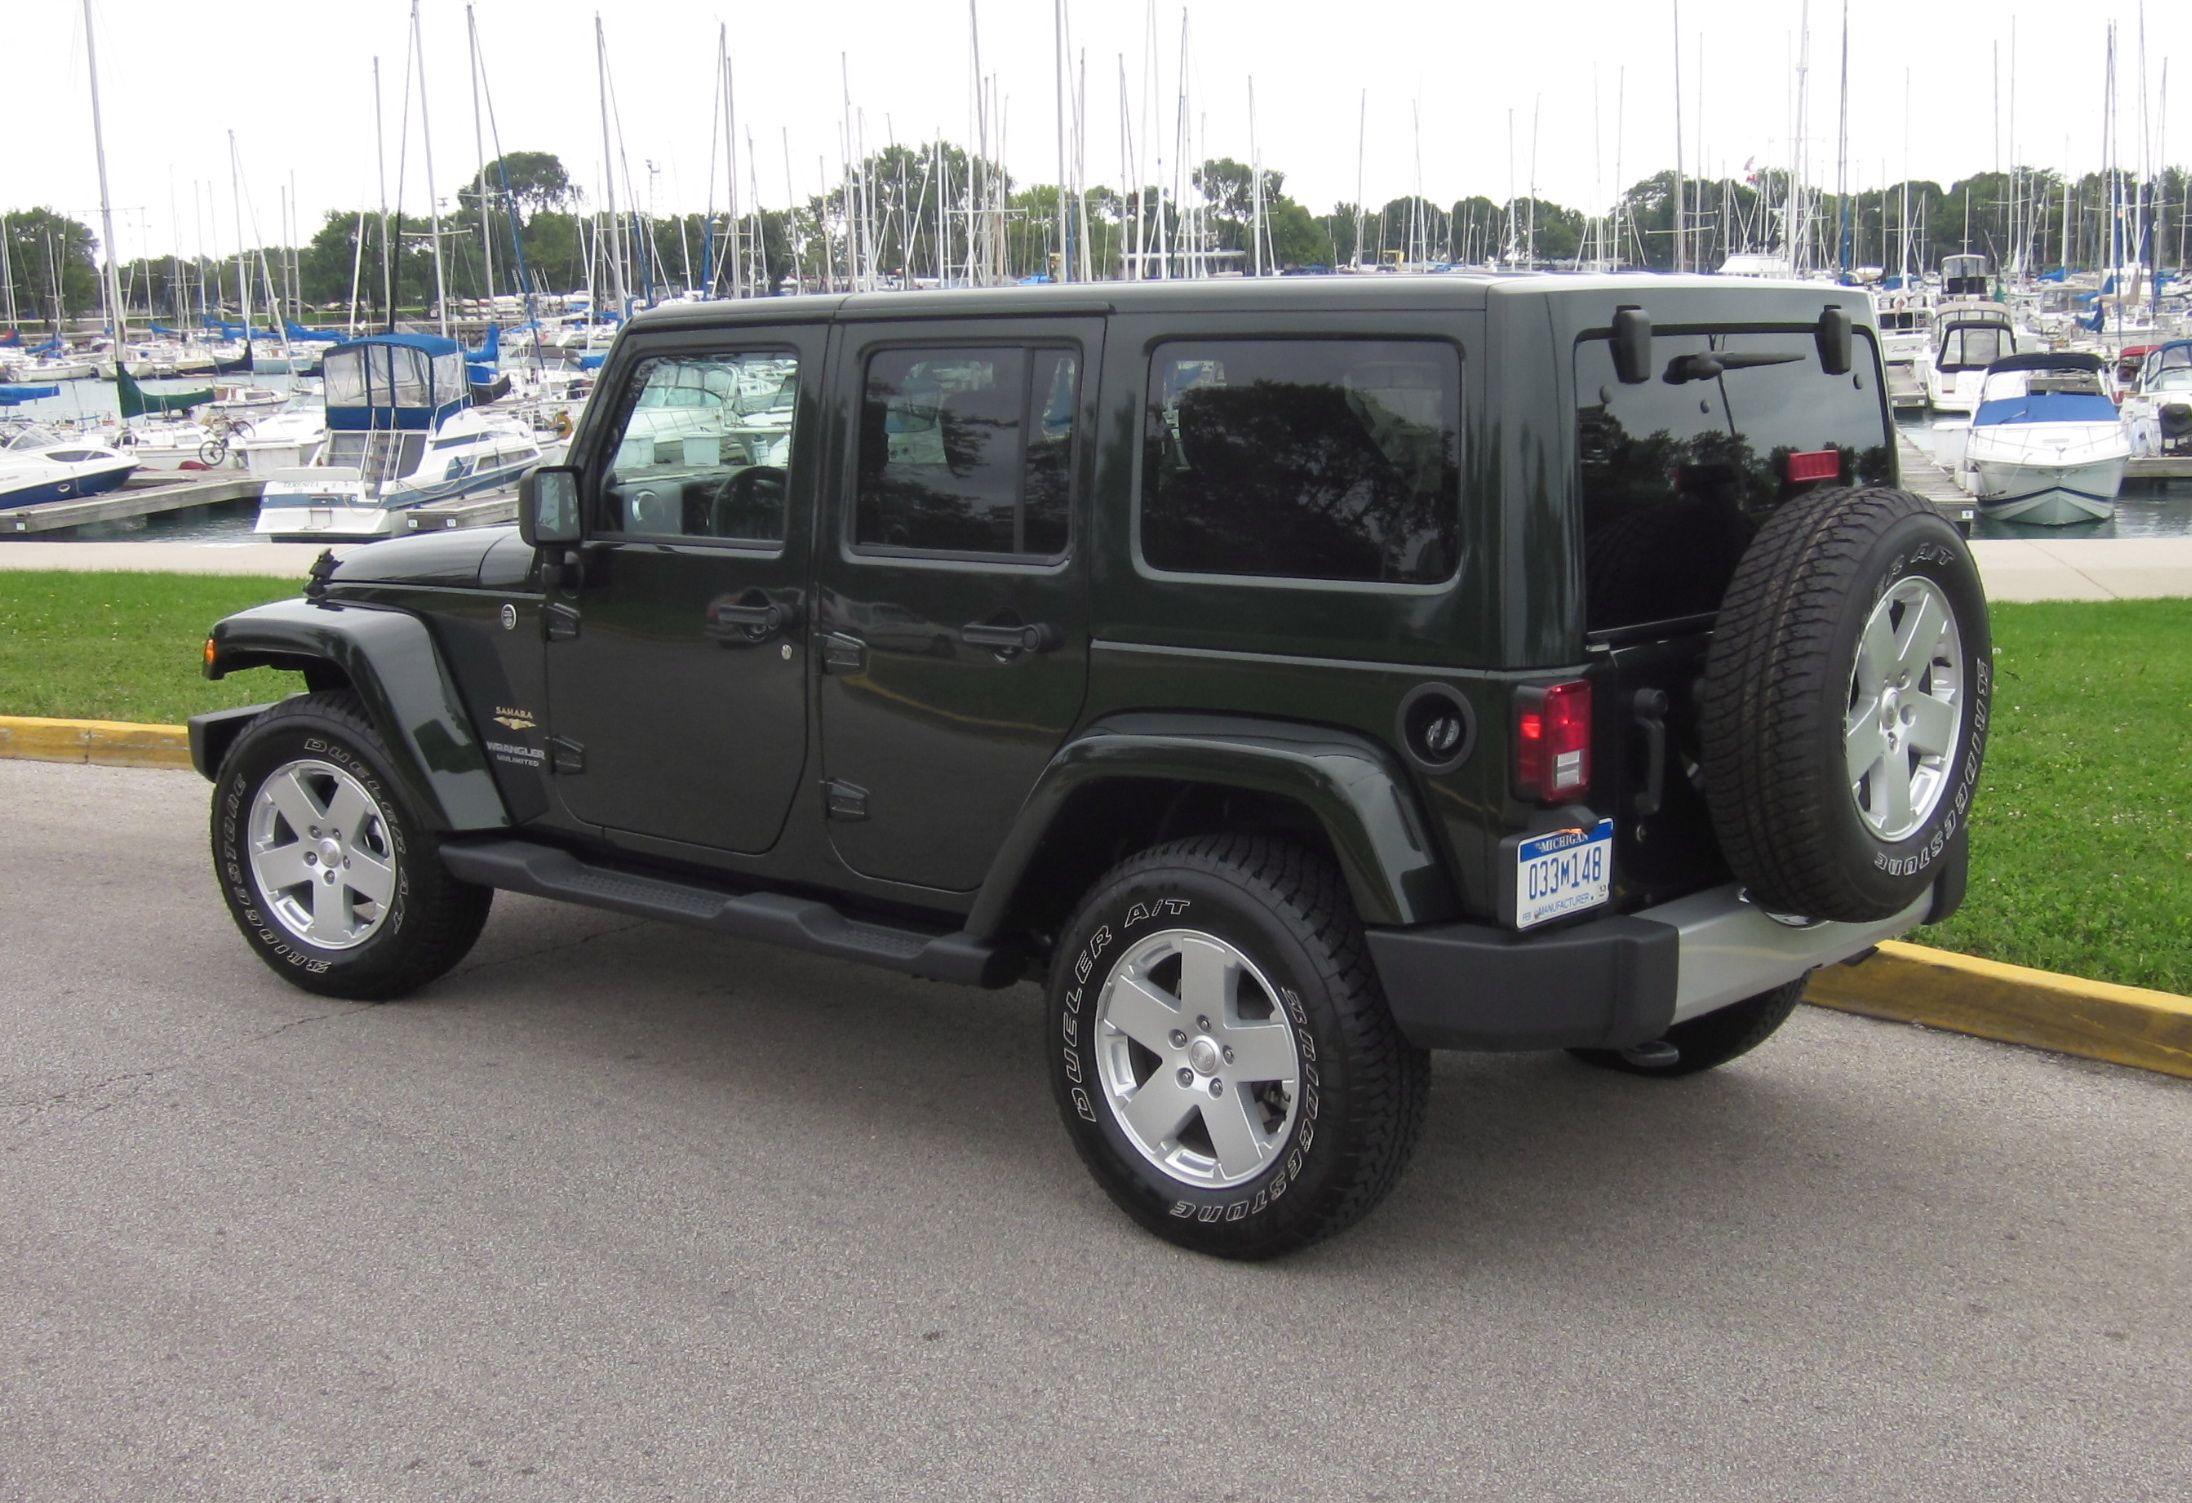 2012 Jeep Wrangler 4 Door SUV AUV vehicles Pinterest